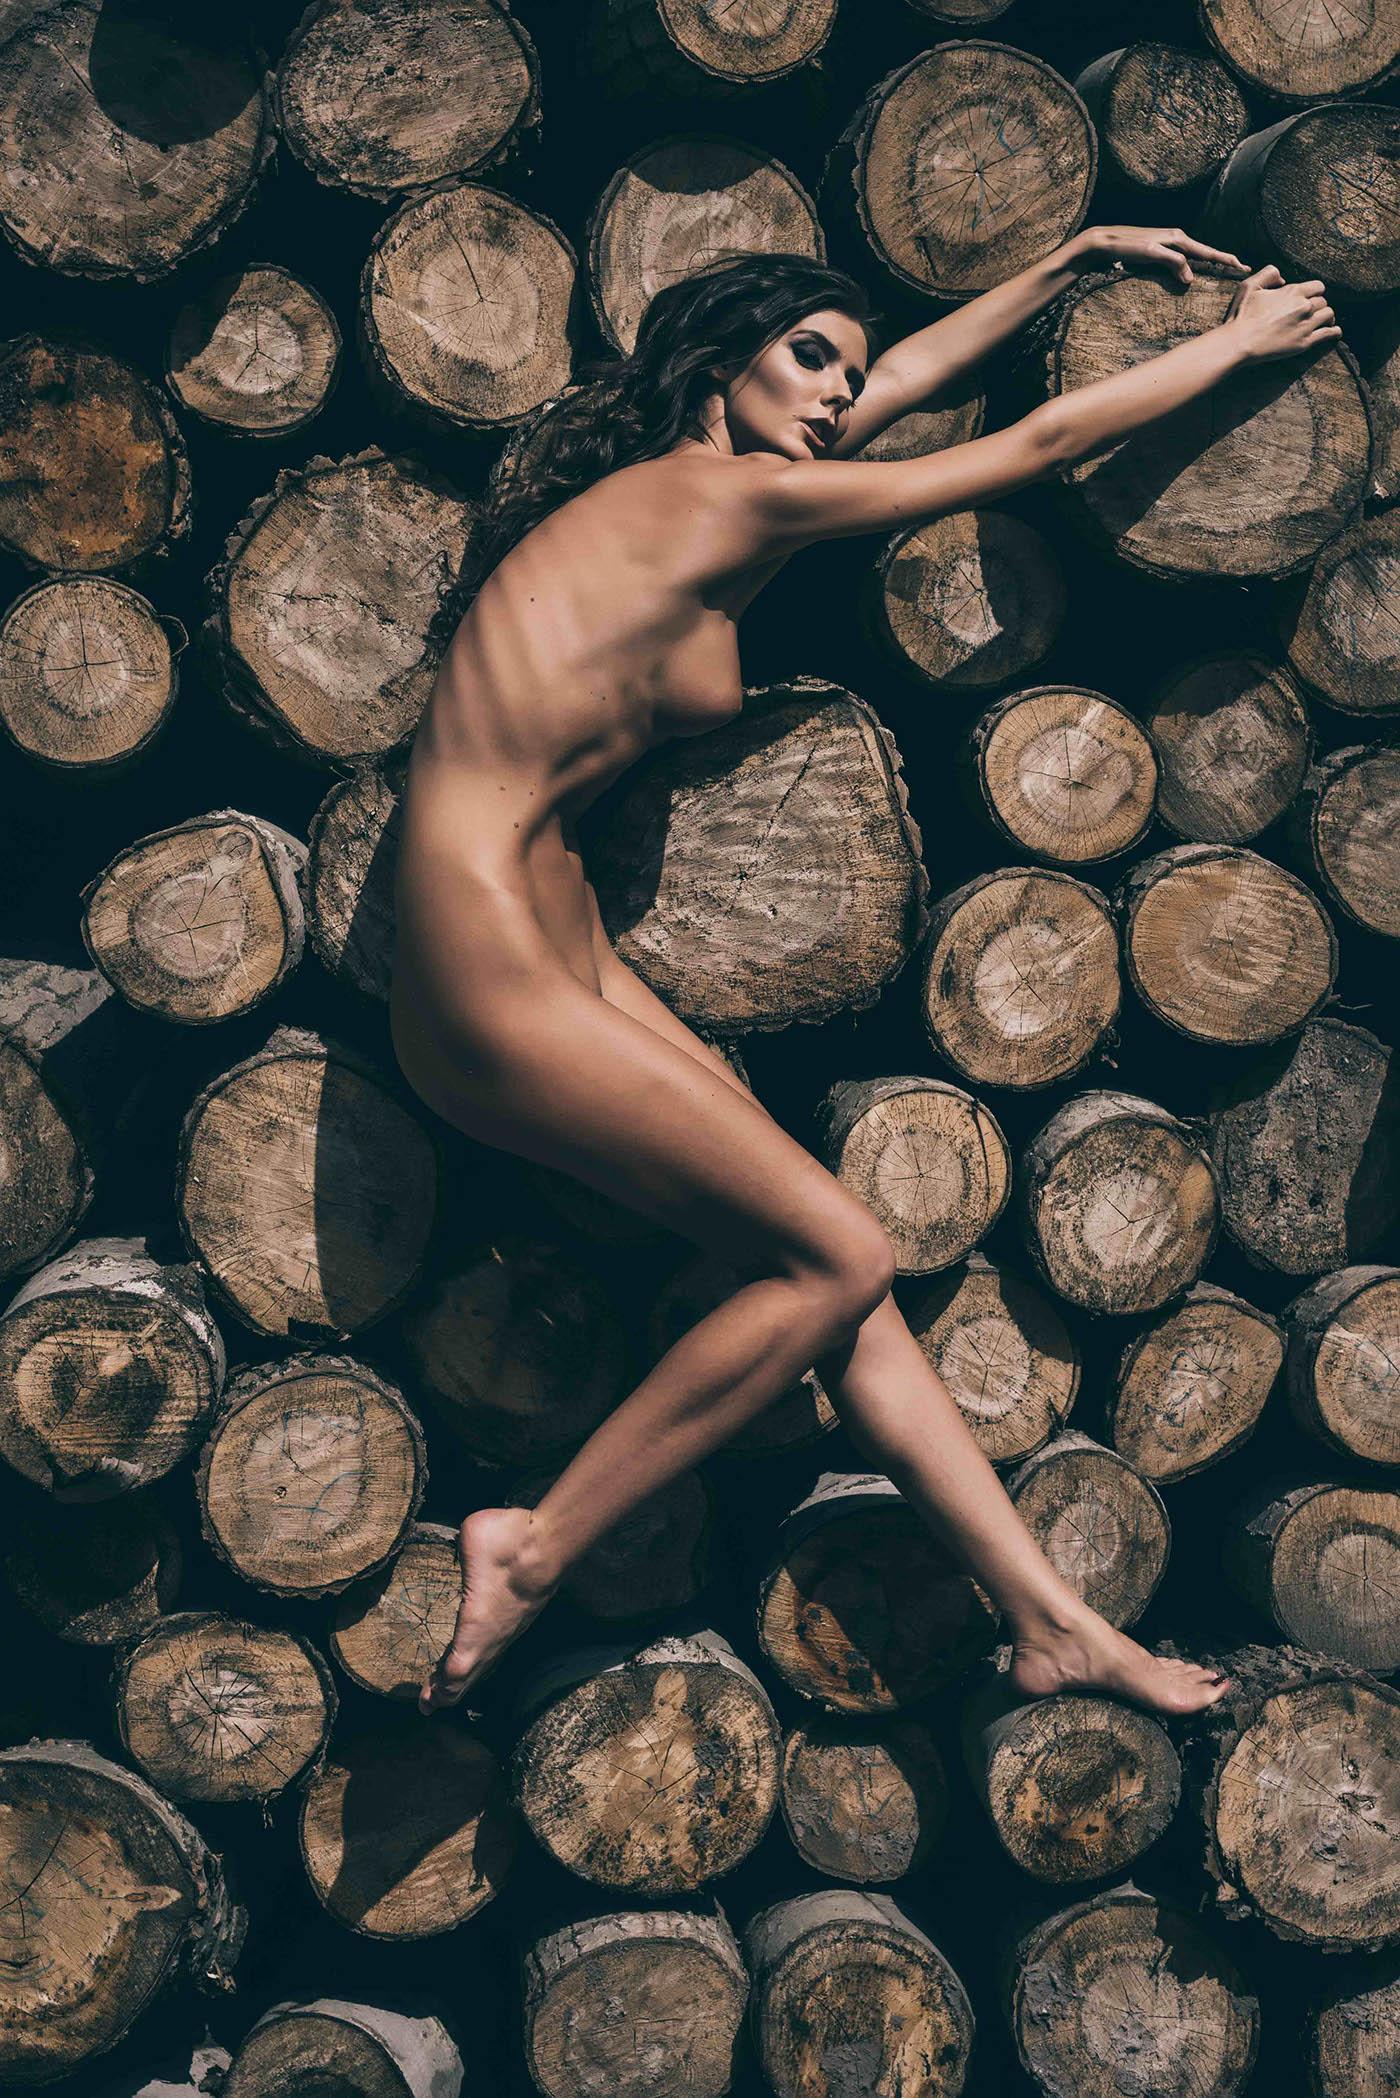 Raw beauty / Alberto Maccari